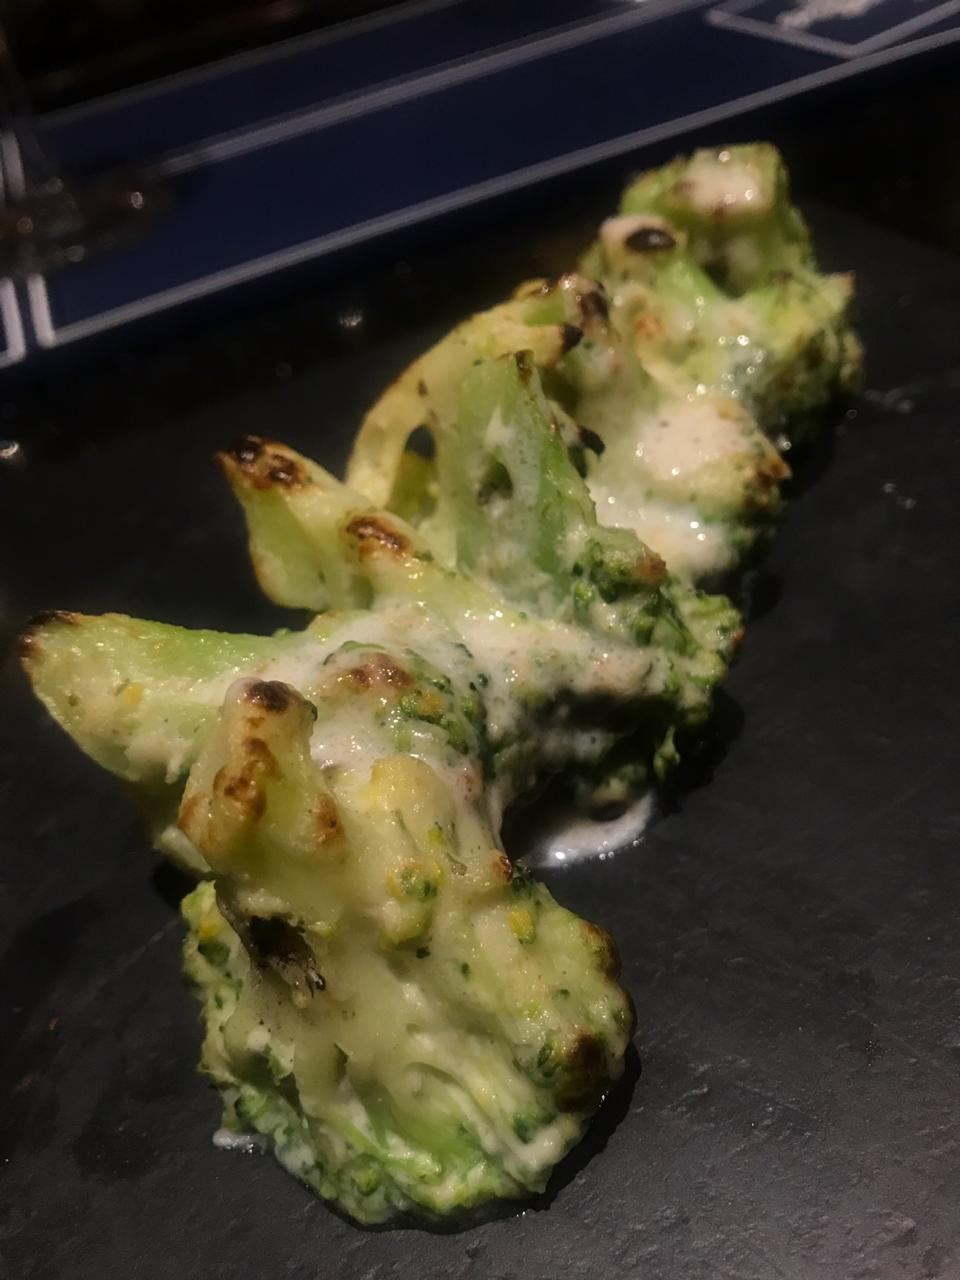 Malai Broccoli